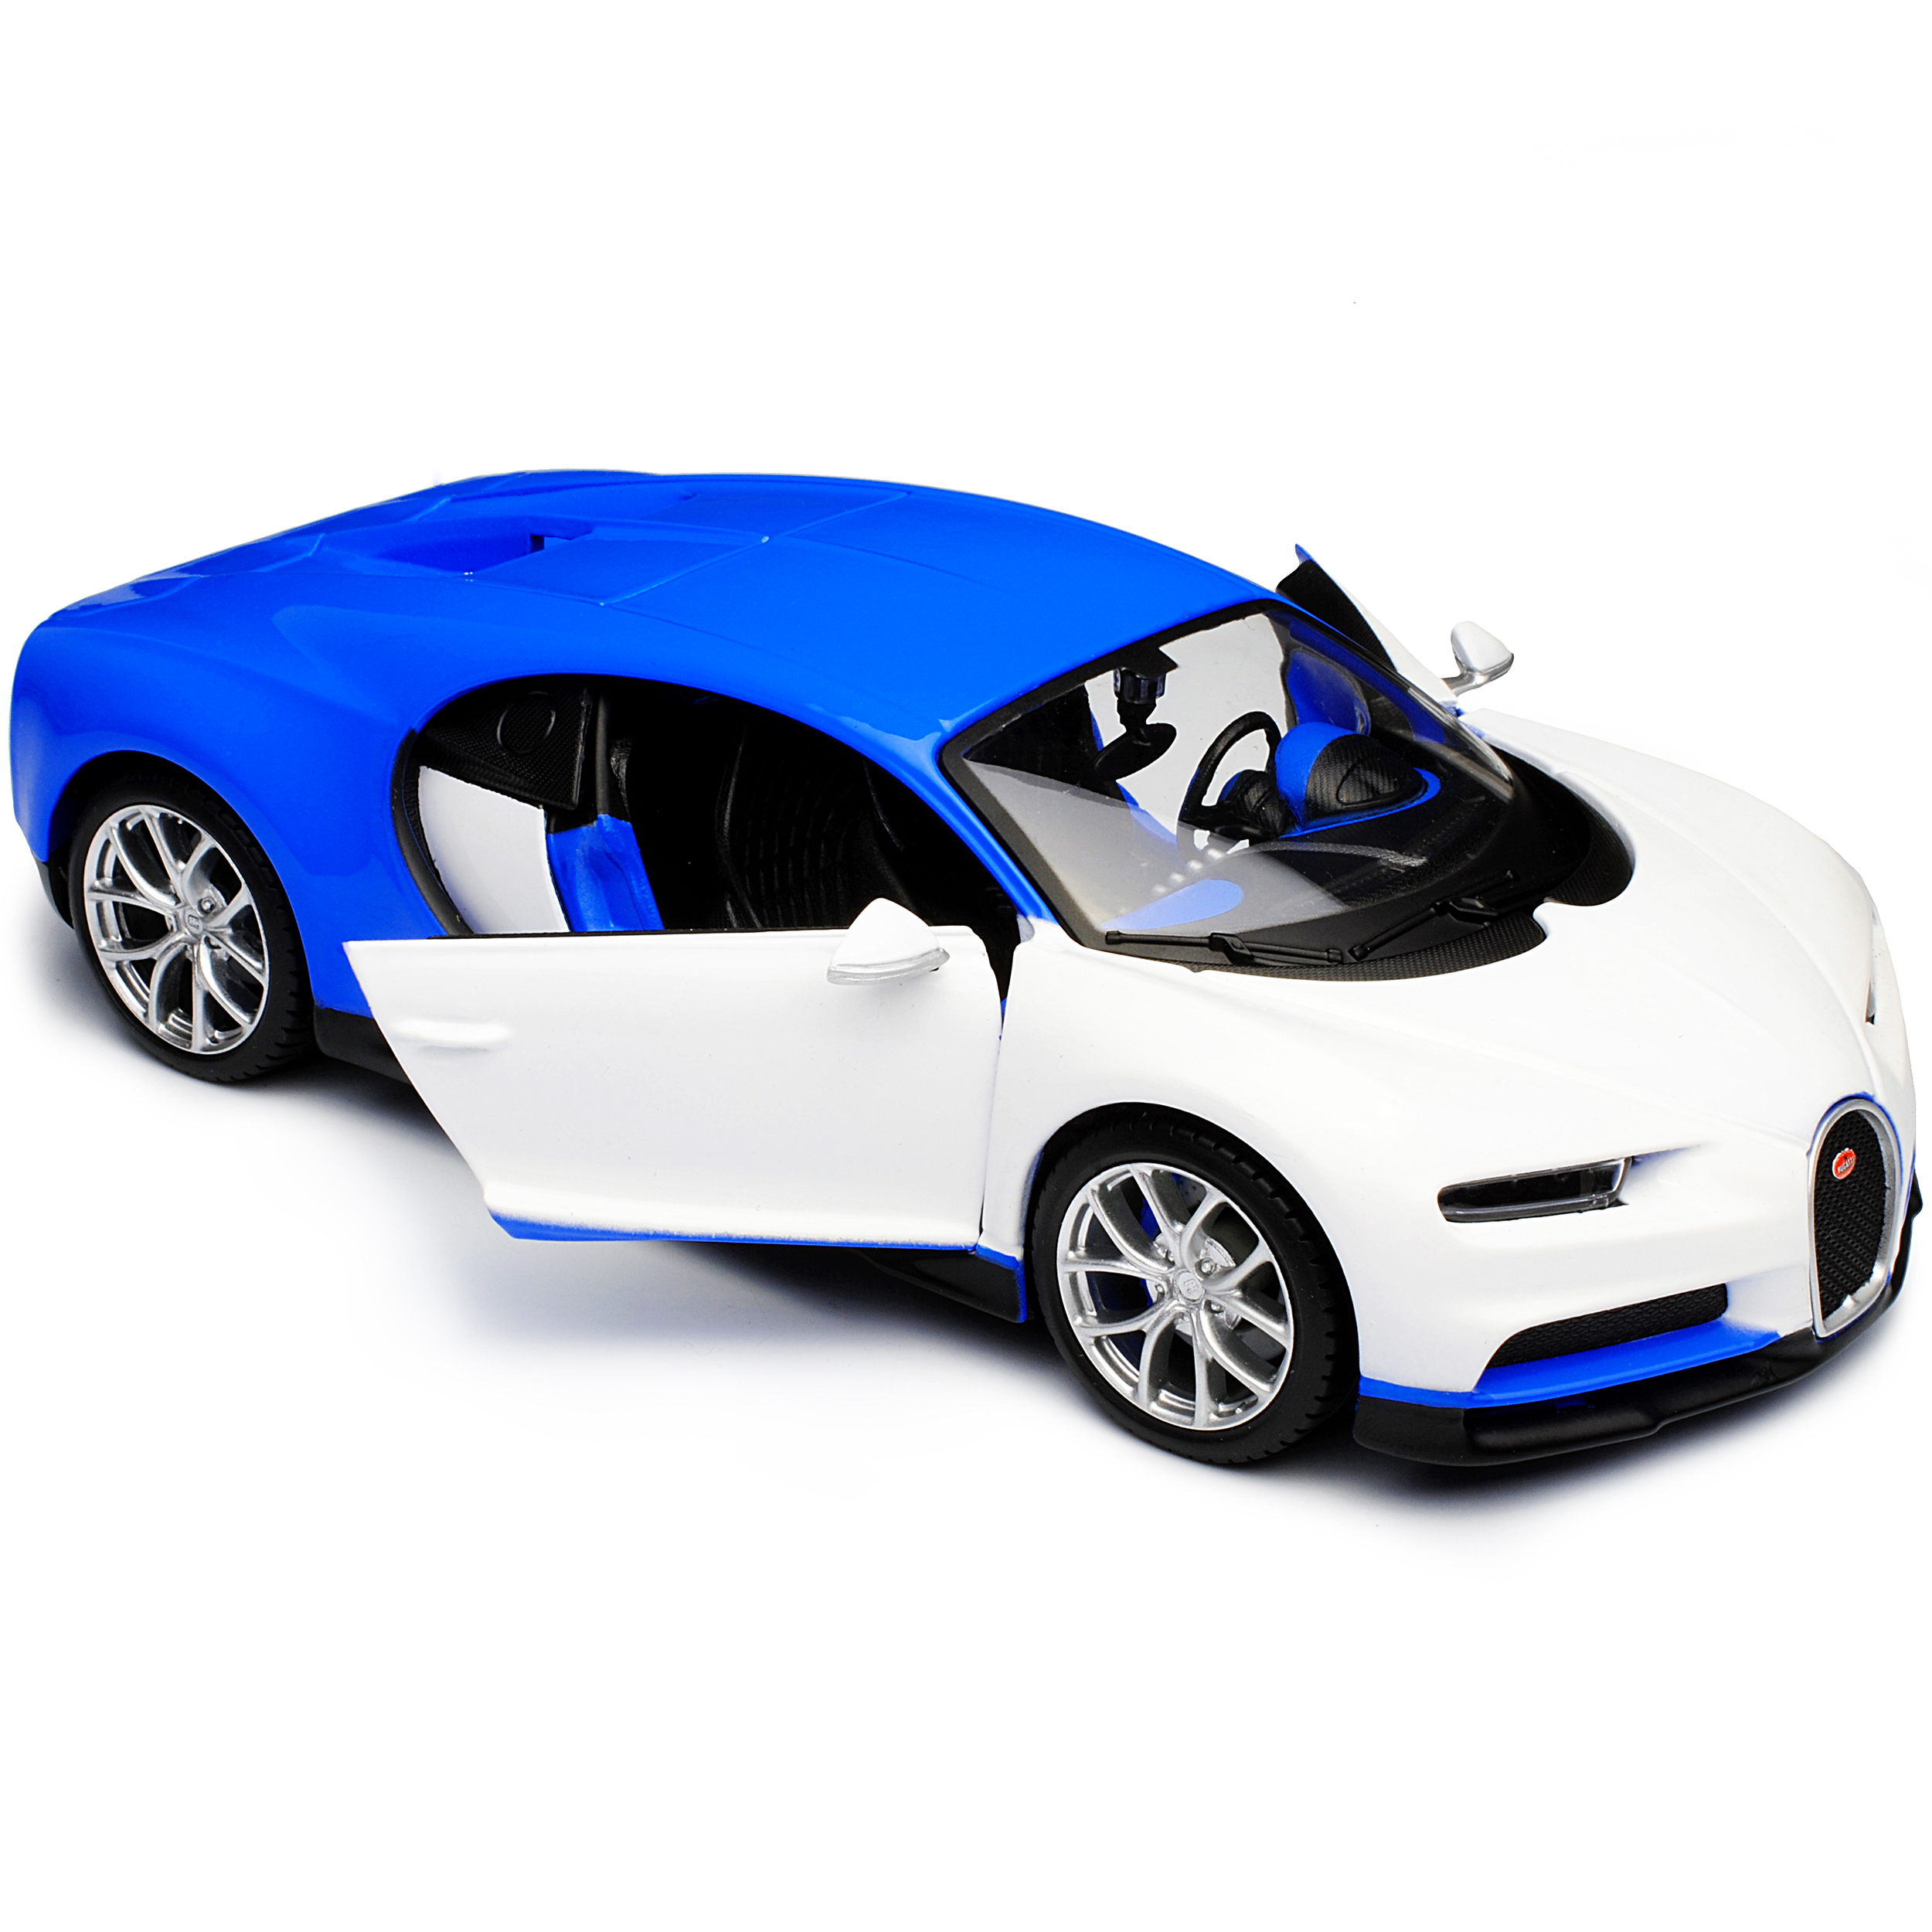 Bugatti Chiron Coupe Blau Weiss Tuning Version Ab 2016 1//24 Maisto Modell Auto..